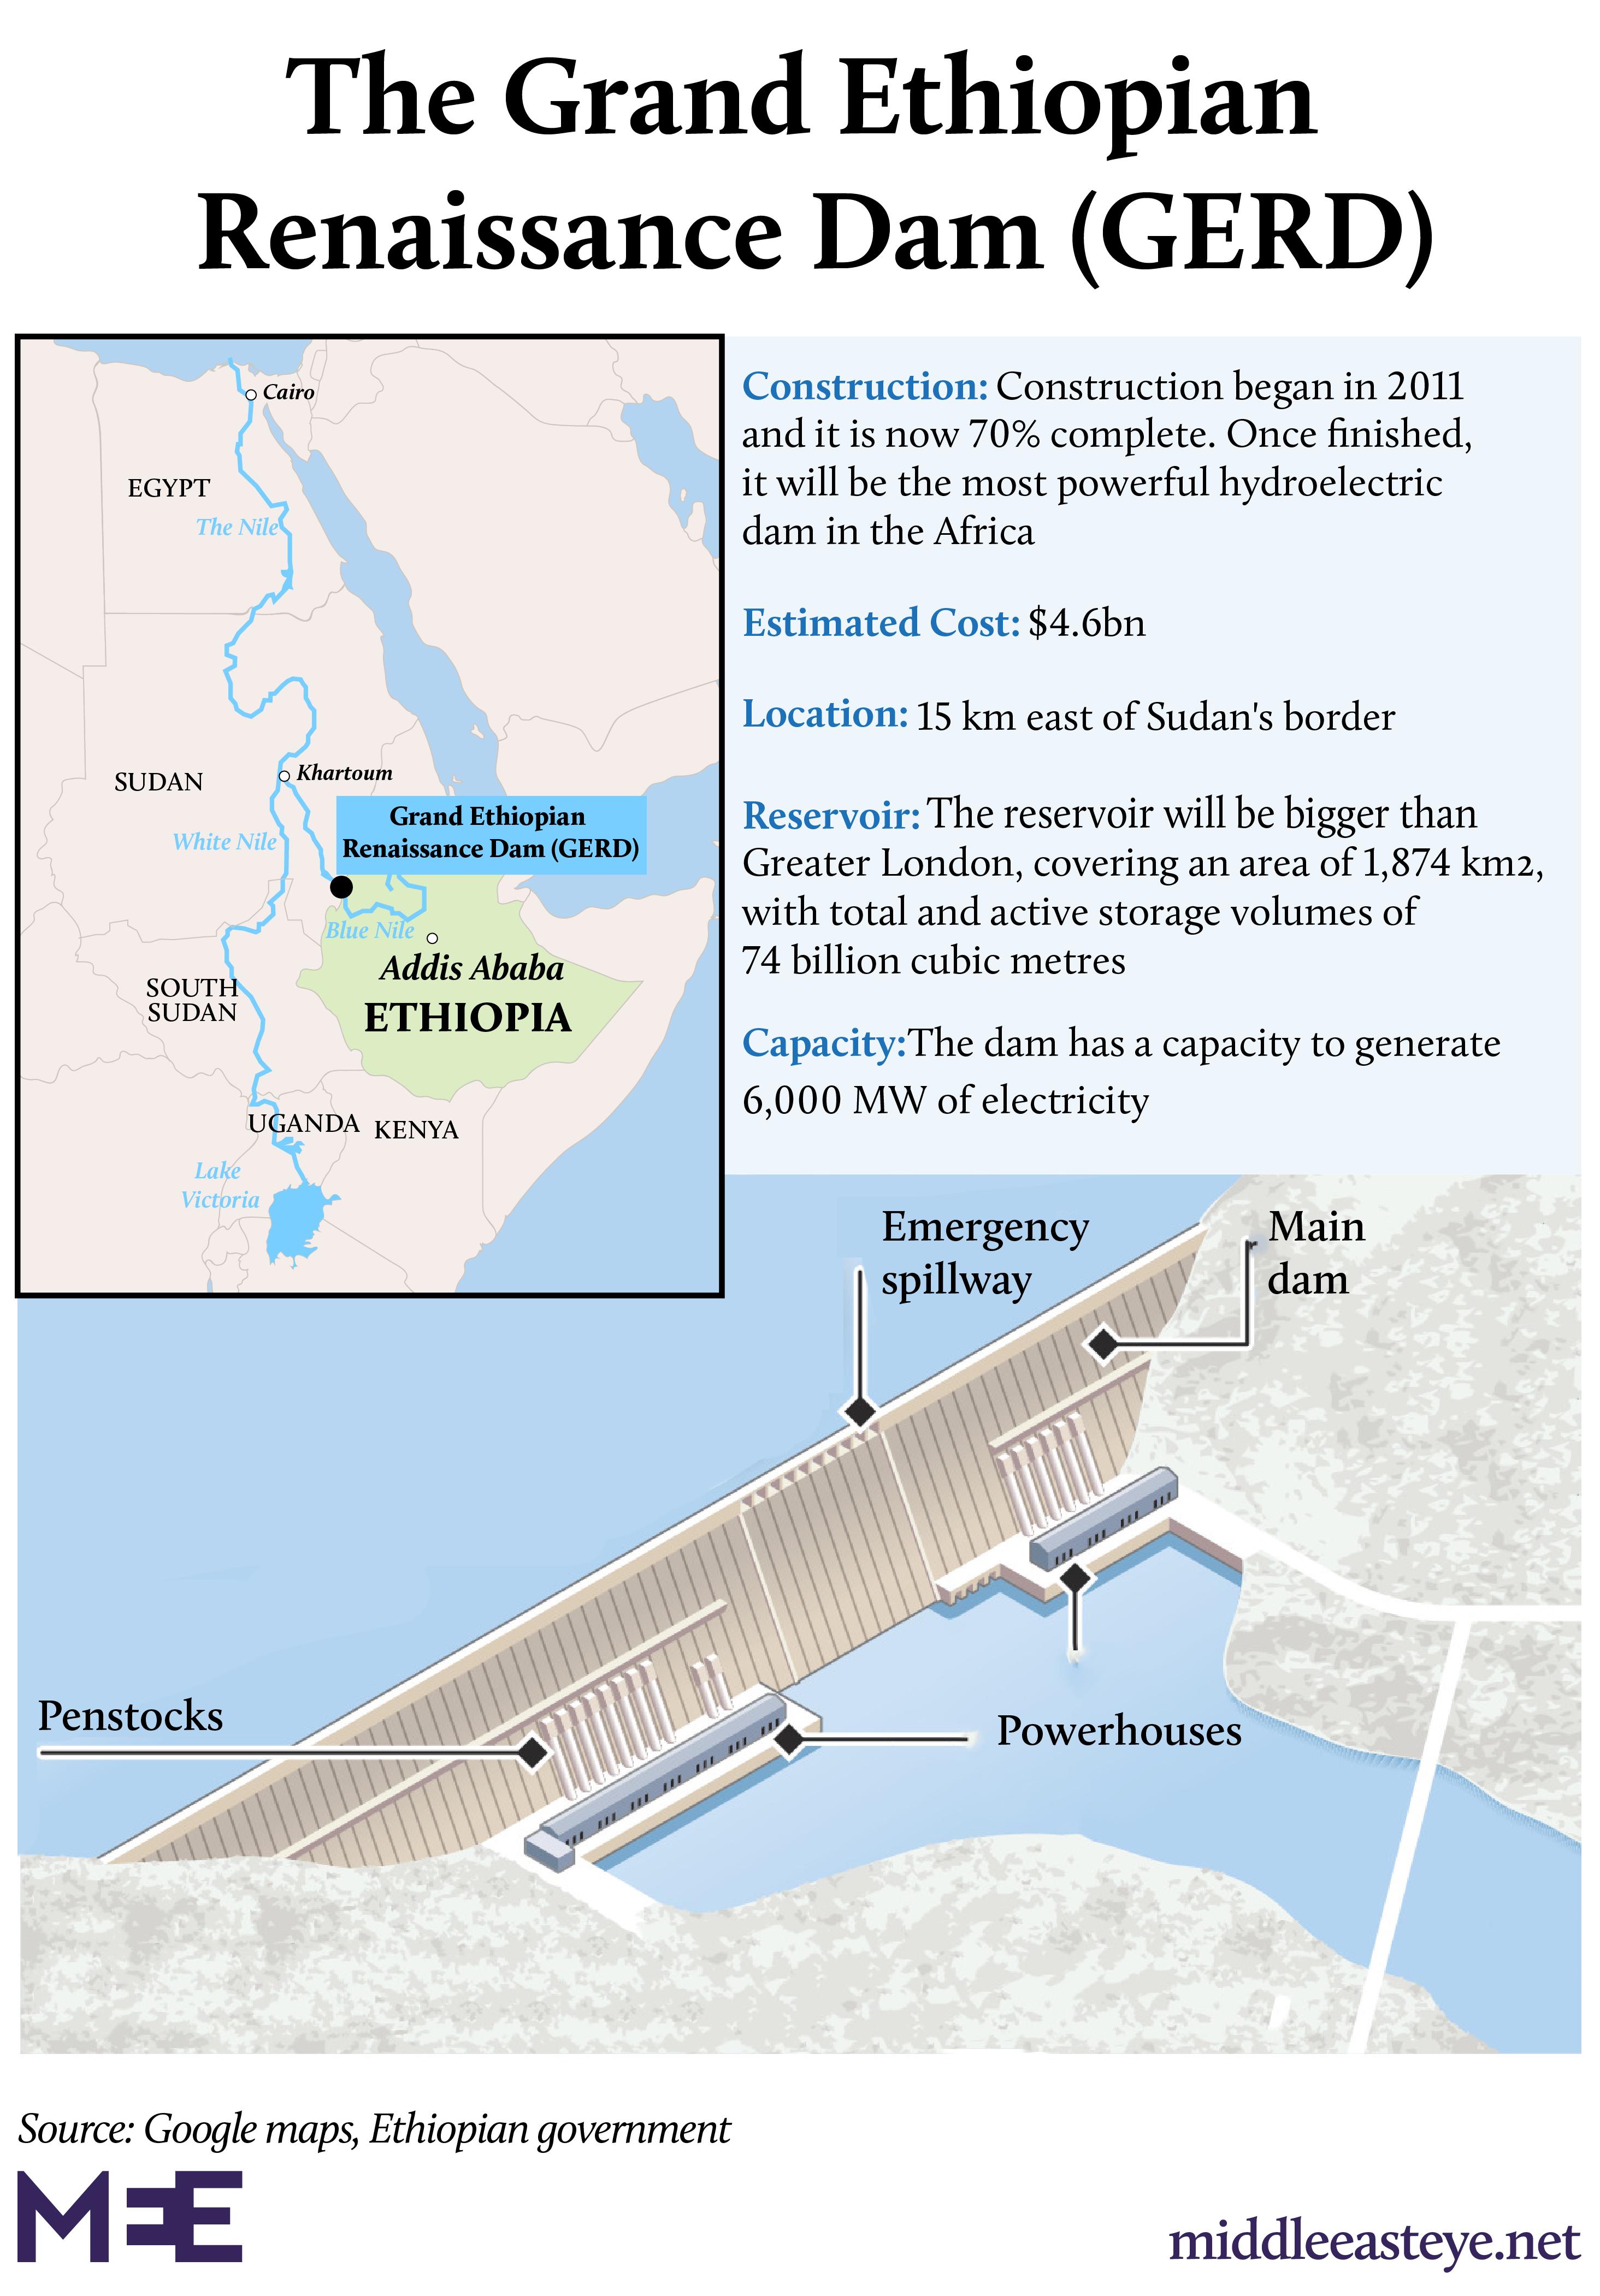 Infographic - The Grand Ethiopian Renaissance Dam